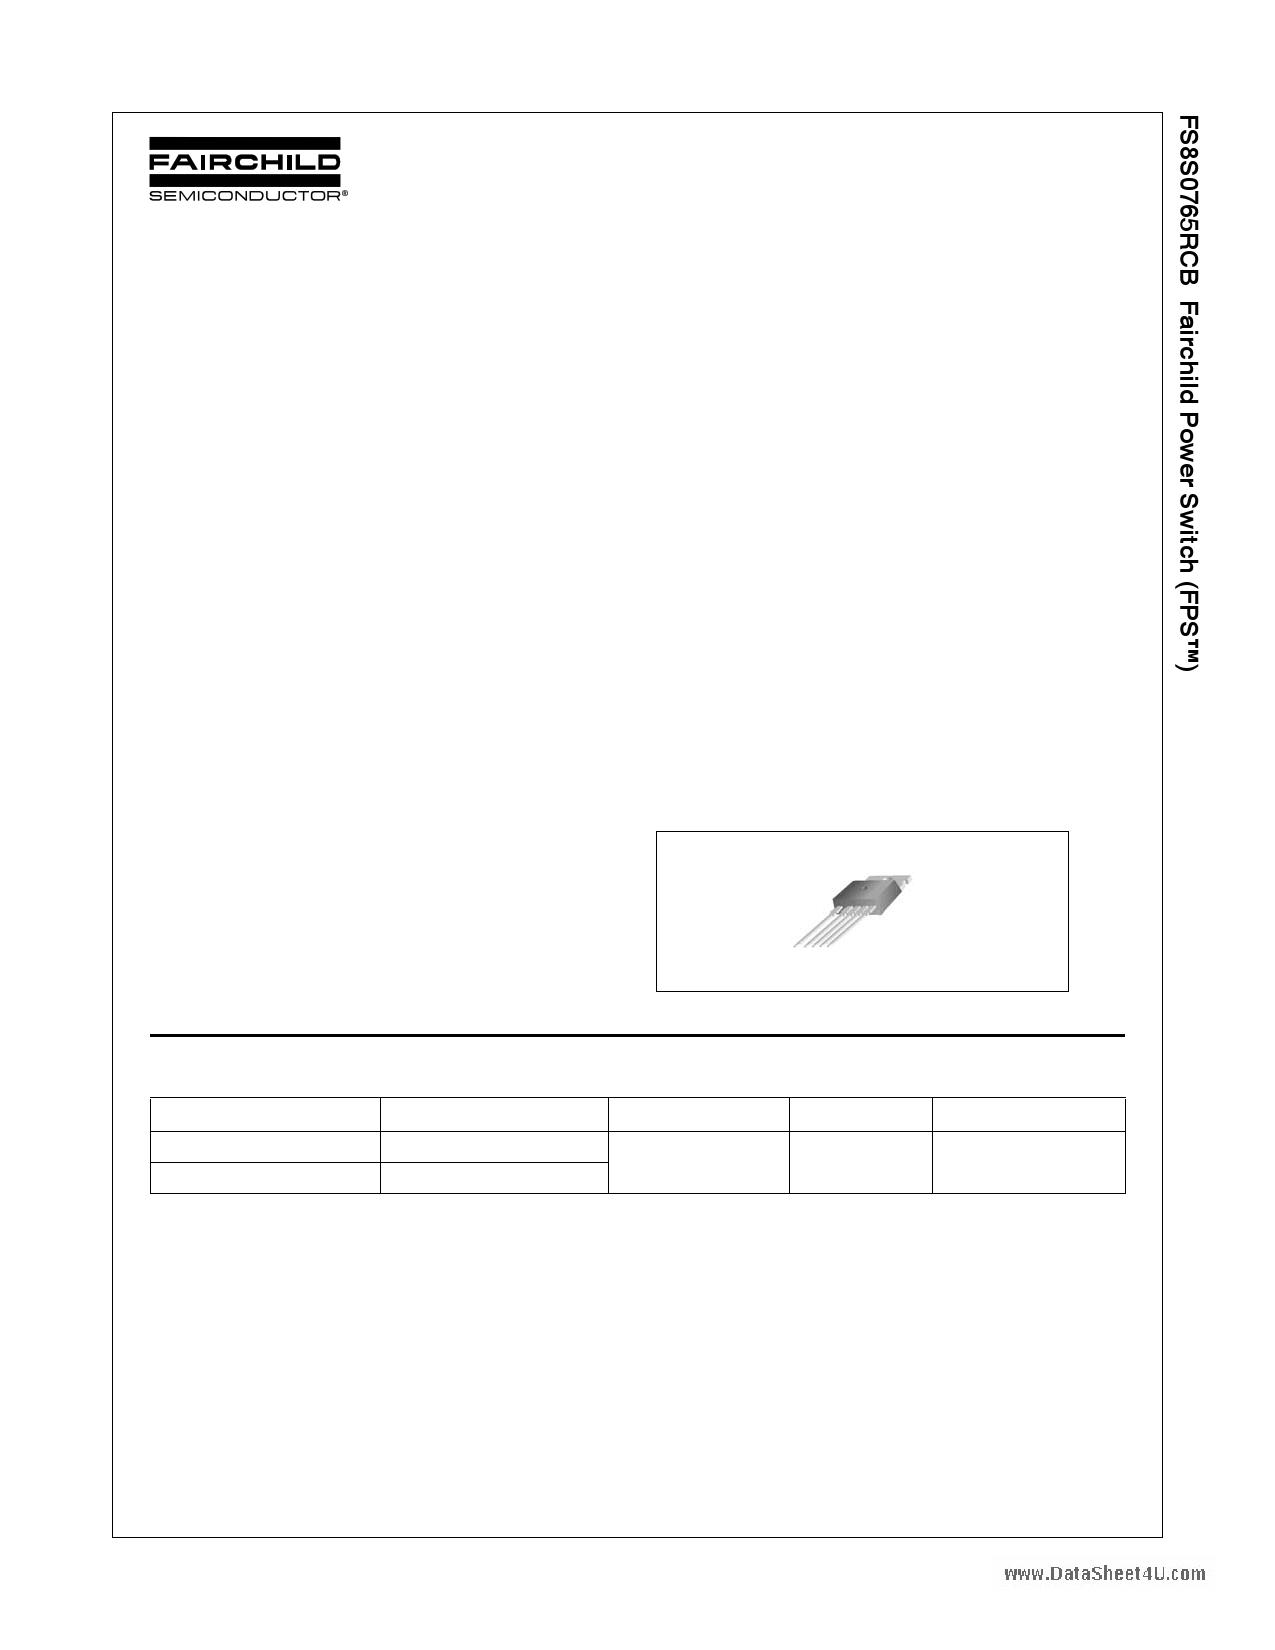 FS8S0765RCBTU datasheet